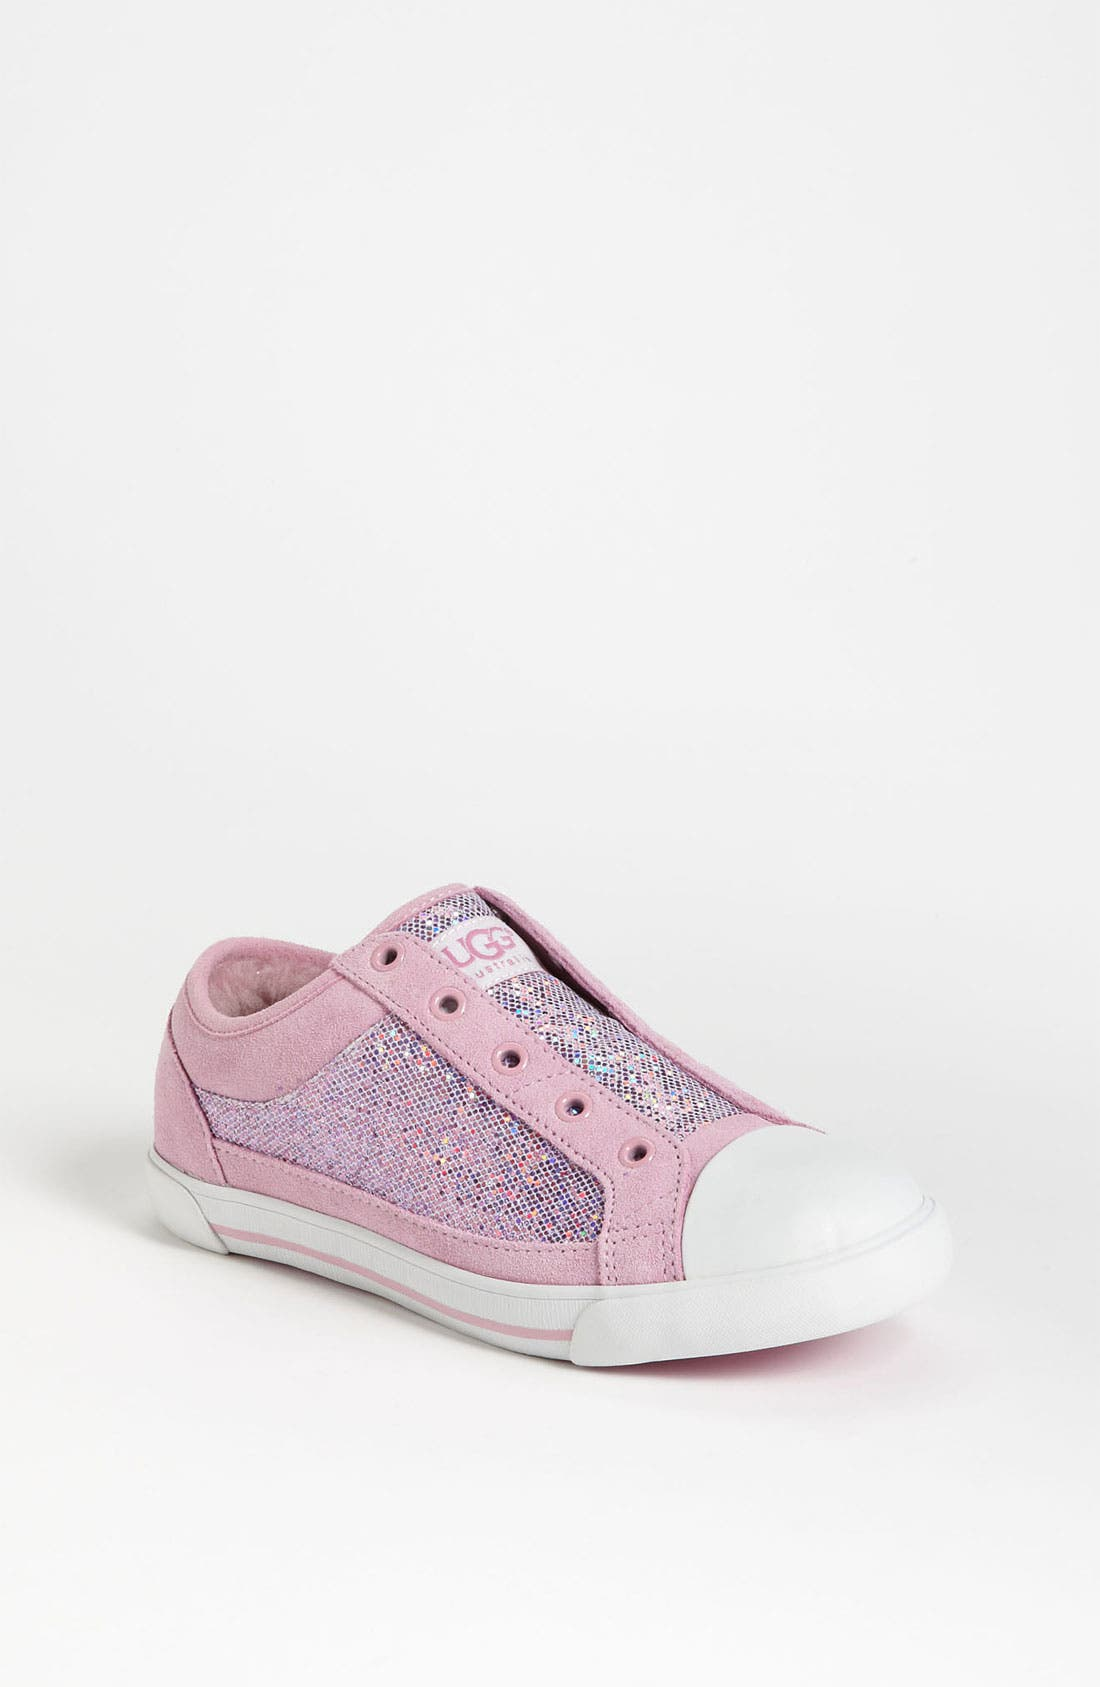 Main Image - UGG® Australia 'Laela' Sneaker (Toddler, Little Kid & Big Kid)